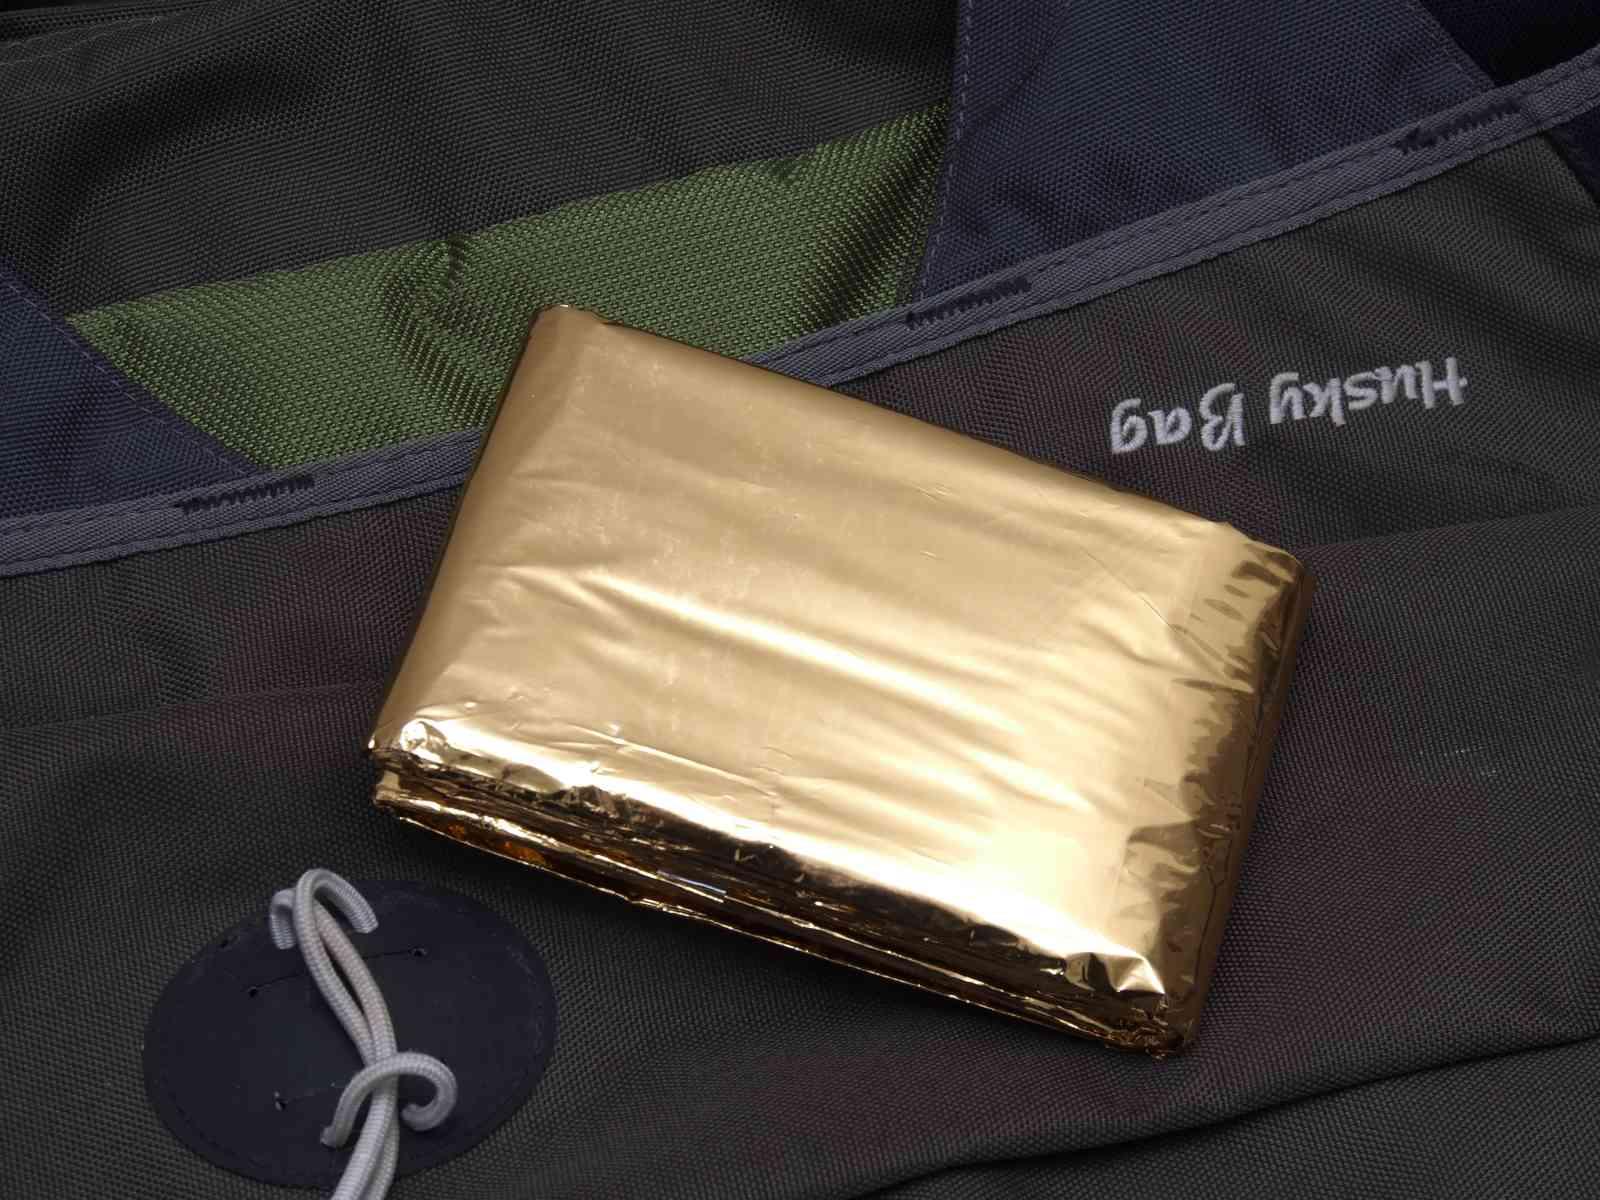 Survival-Kit Packliste - Rettungsdecke